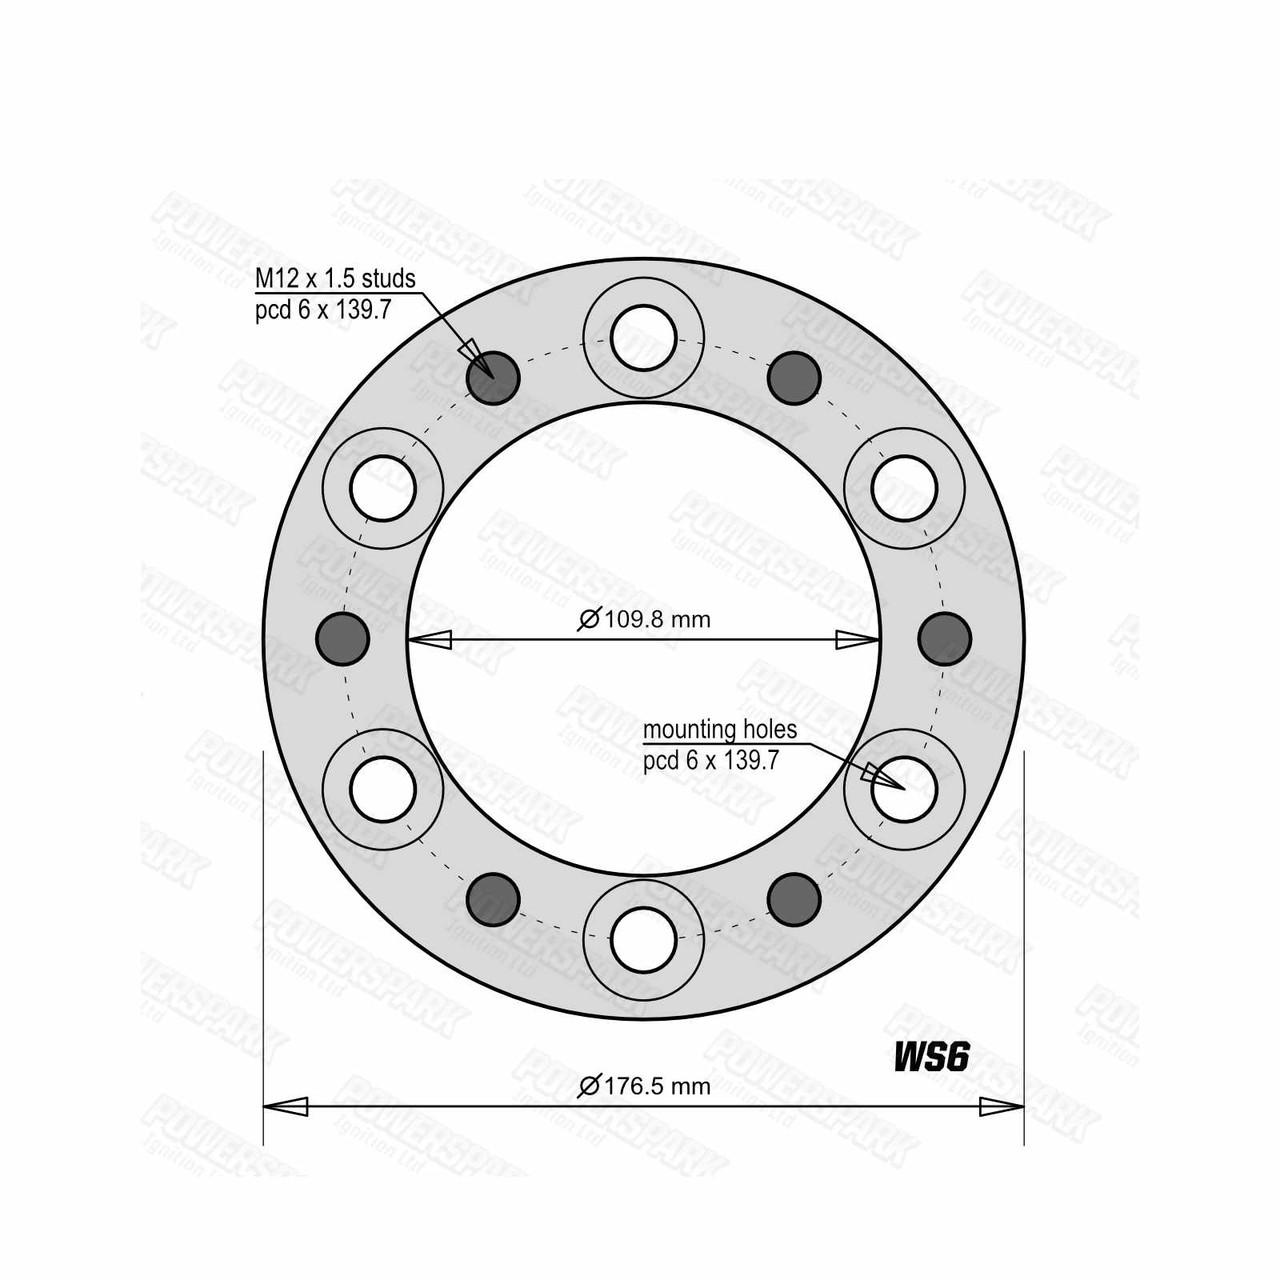 1 Bulldog 30mm Wheel Spacer To Fit 6 Stud Toyota, Mitsubishi, Isuzu, Ford, Vauxhall 4x4 Vehicles